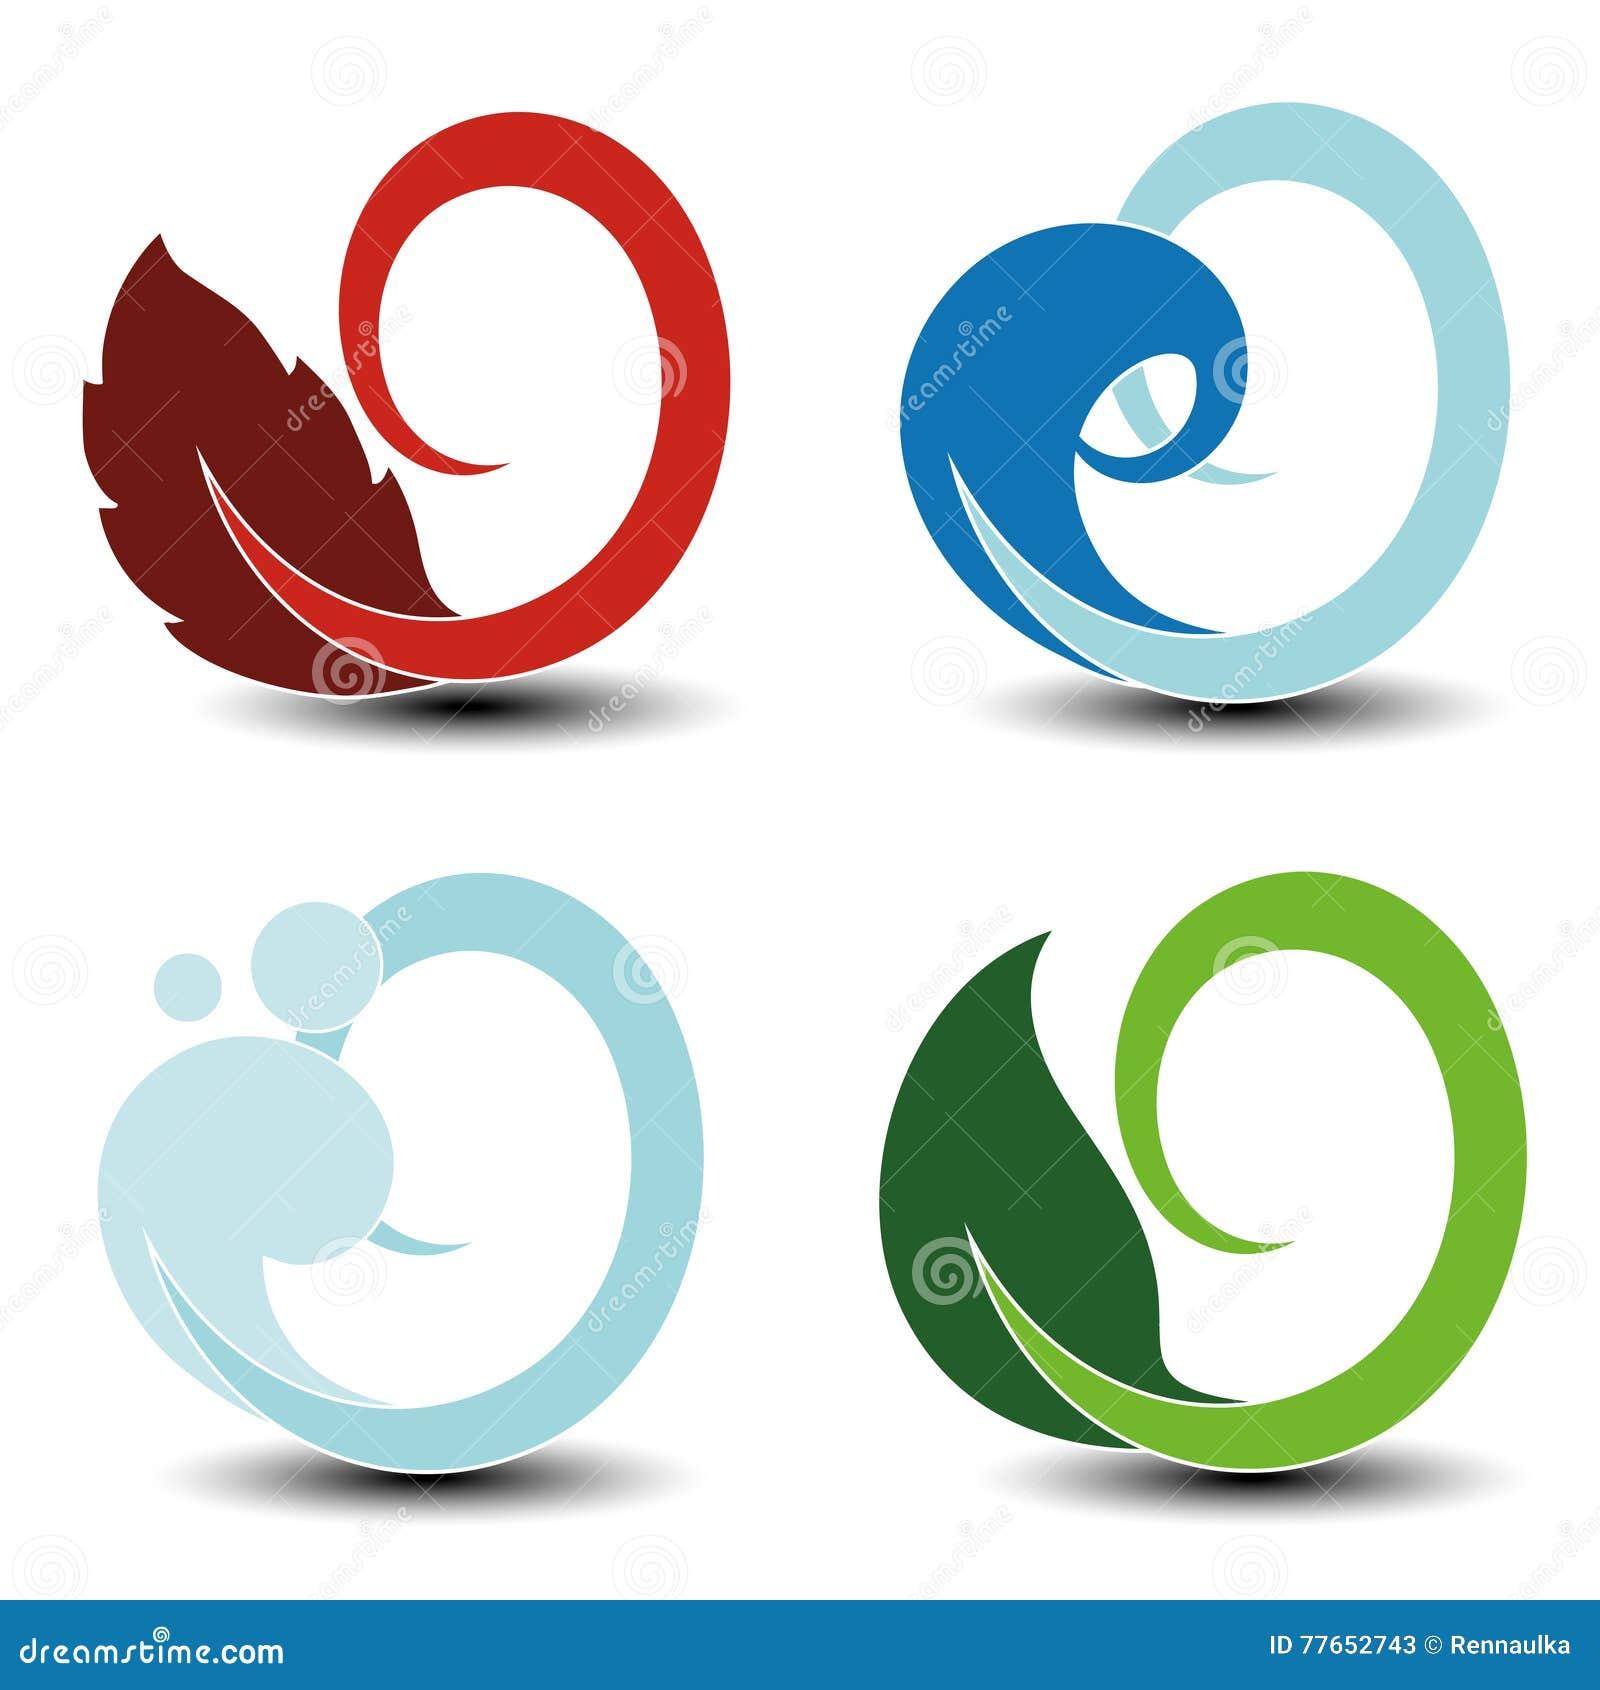 Natural Symbols Fire Air Water Earth Nature Circular Elements